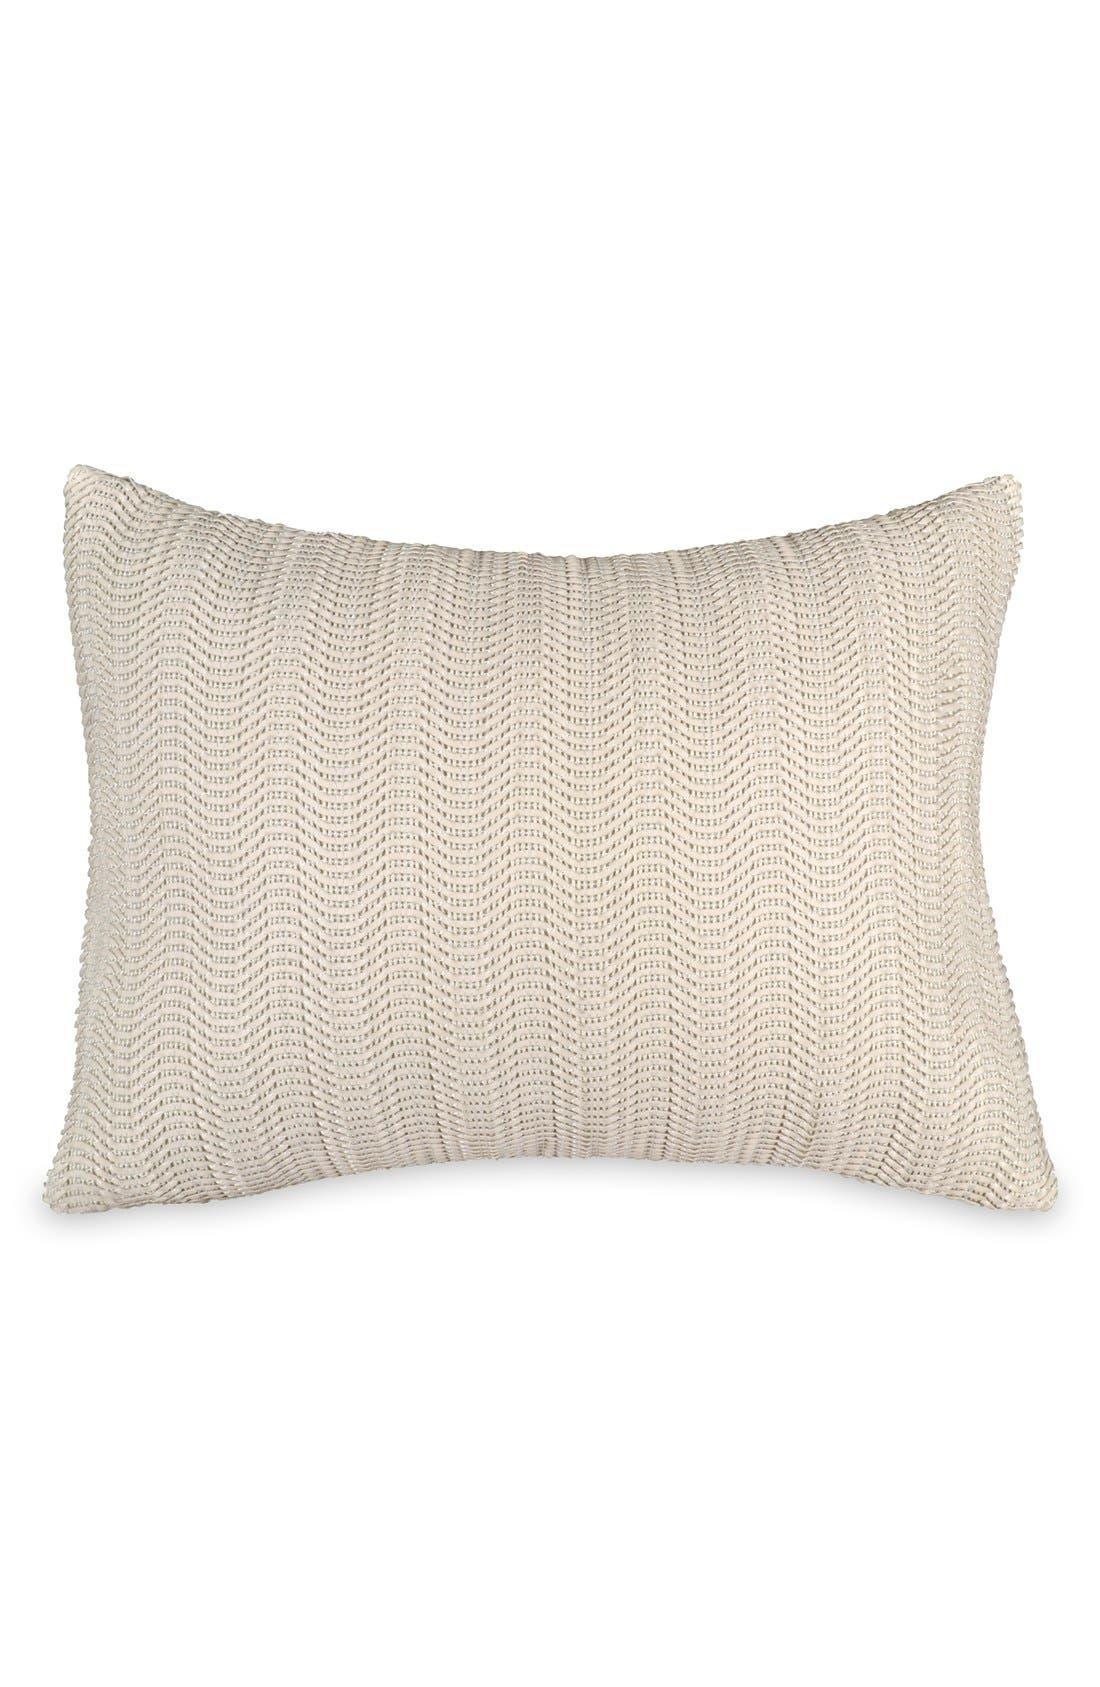 Alternate Image 1 Selected - Donna Karan Collection 'Moonscape' Woven Pillow